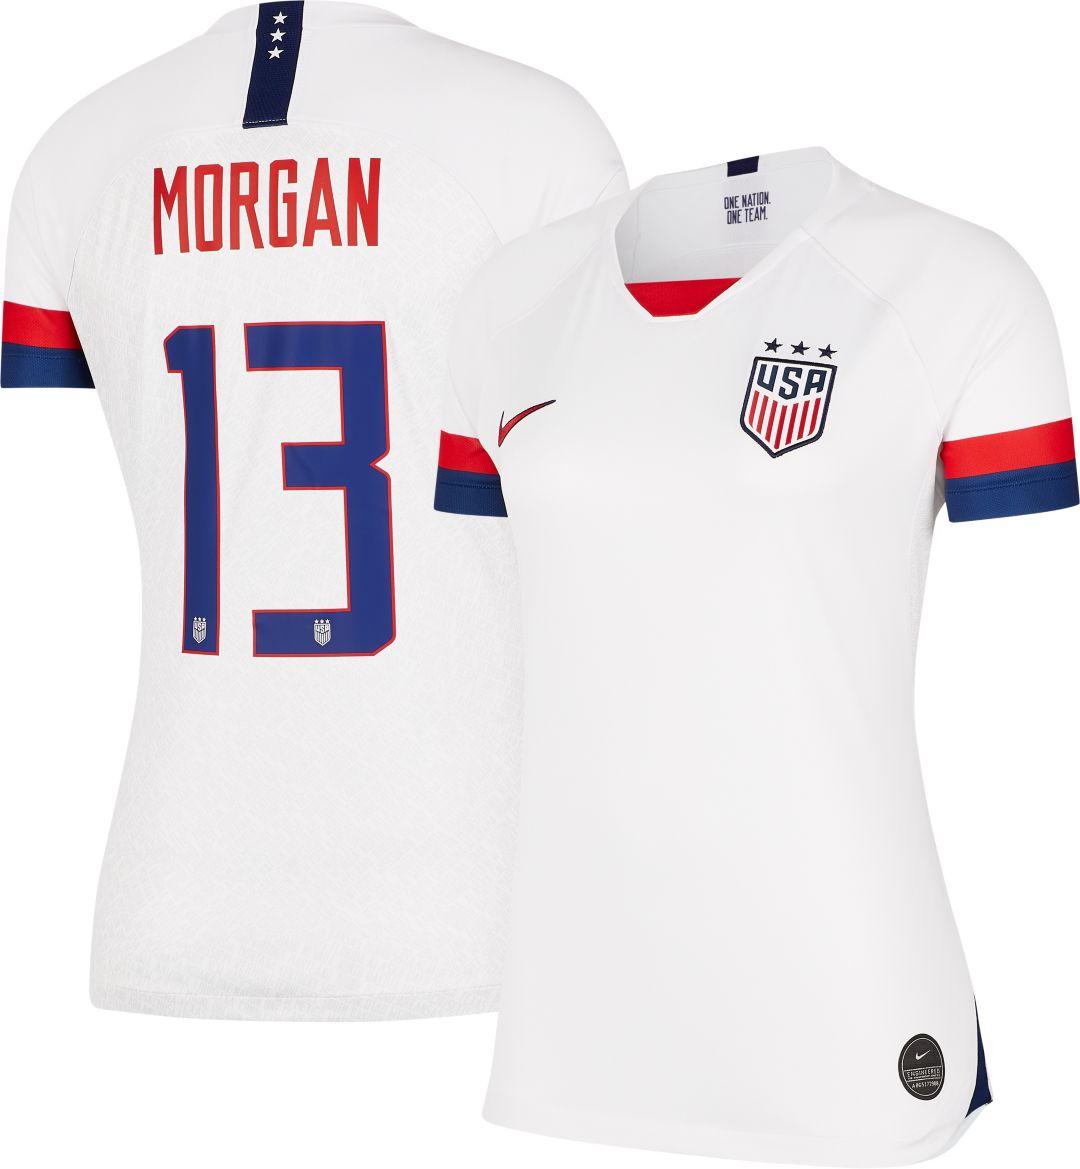 7ea95d48c Nike Women's 2019 FIFA Women's World Cup USA Soccer Alex Morgan #13 ...